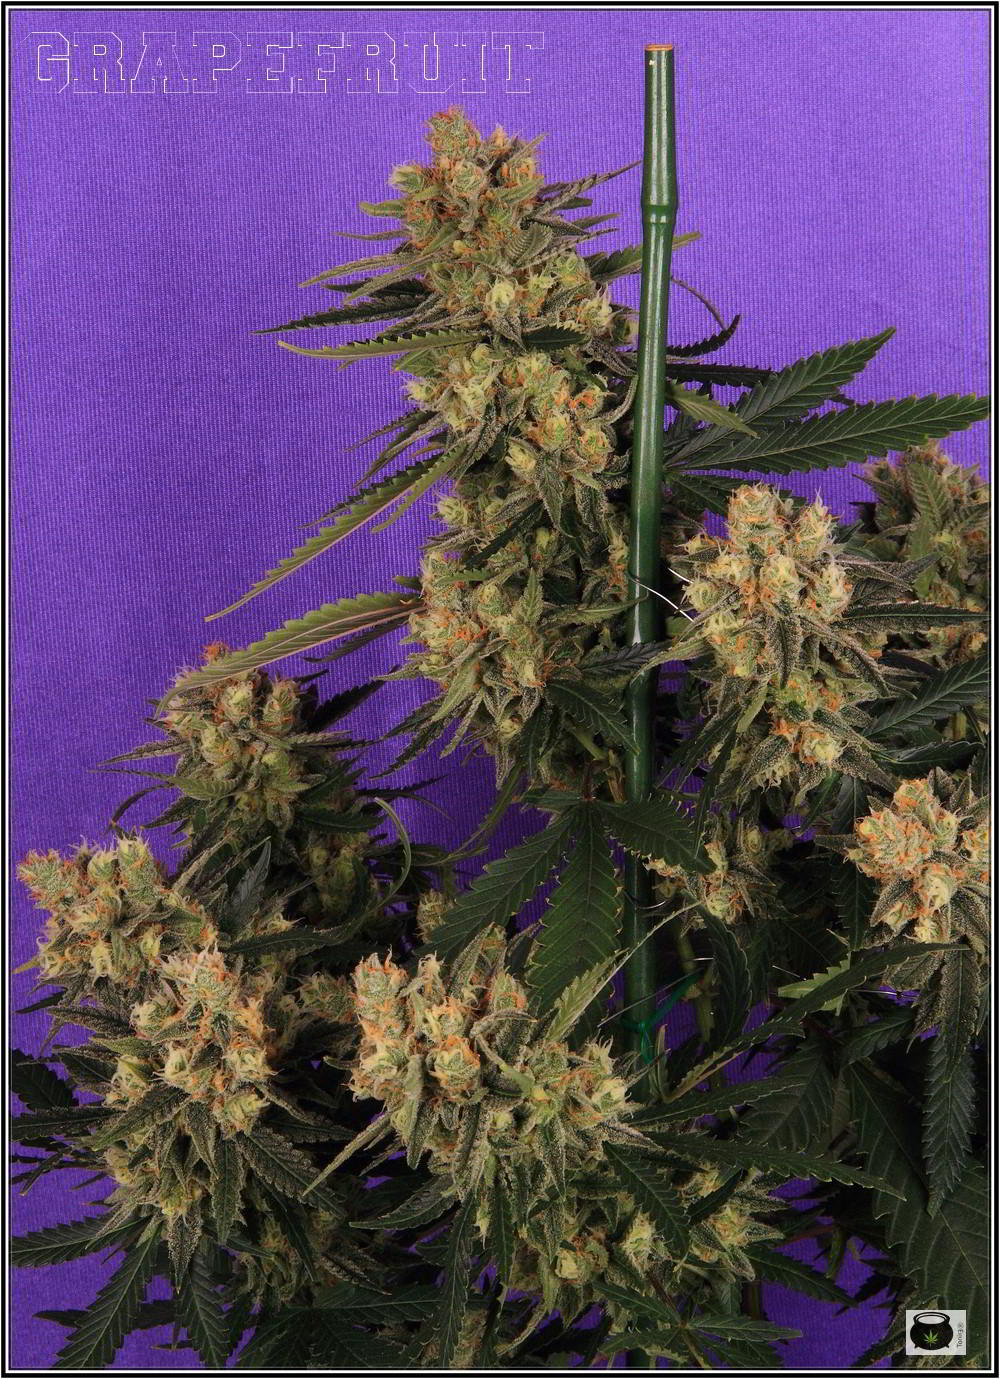 36- Variedad de marihuana Grapefruit 44 días a 12/12 2